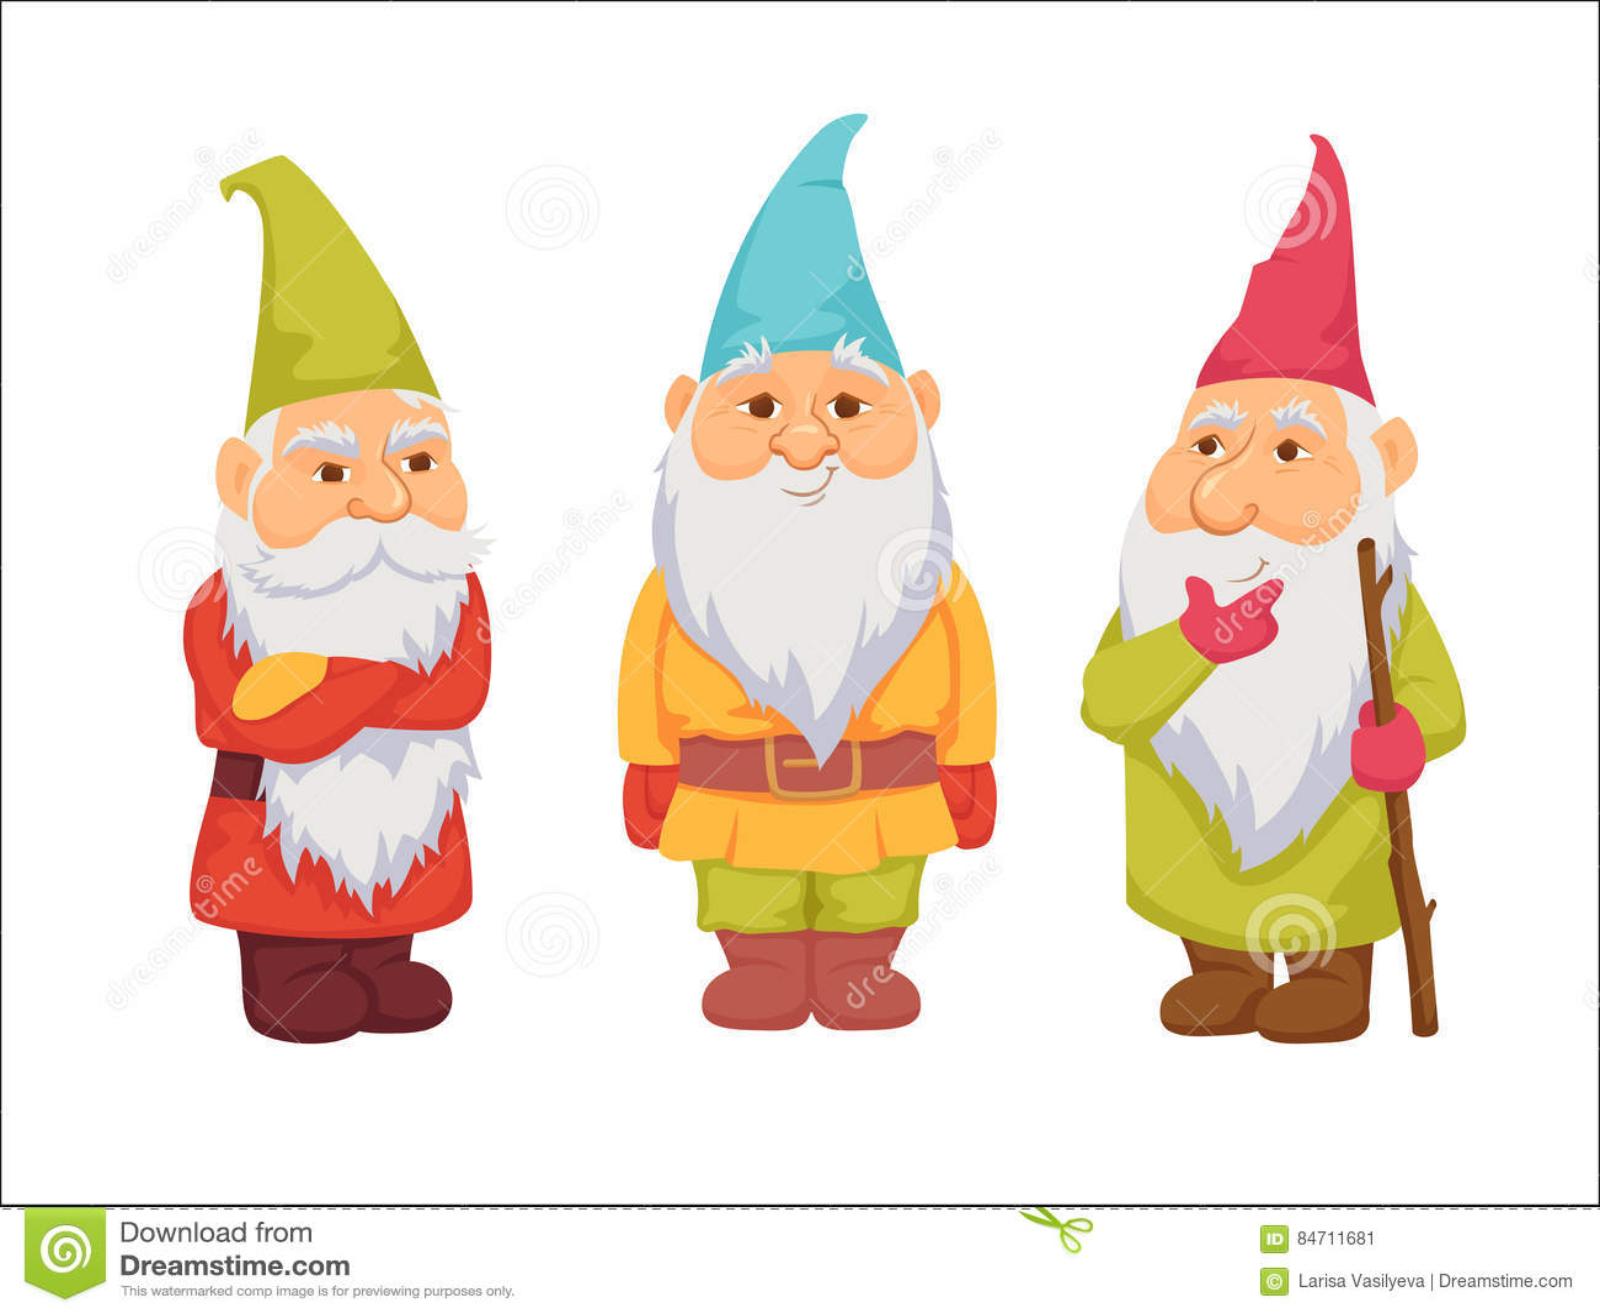 Gnome Clip Art: Gnomes Vector Set Stock Vector. Illustration Of Garden